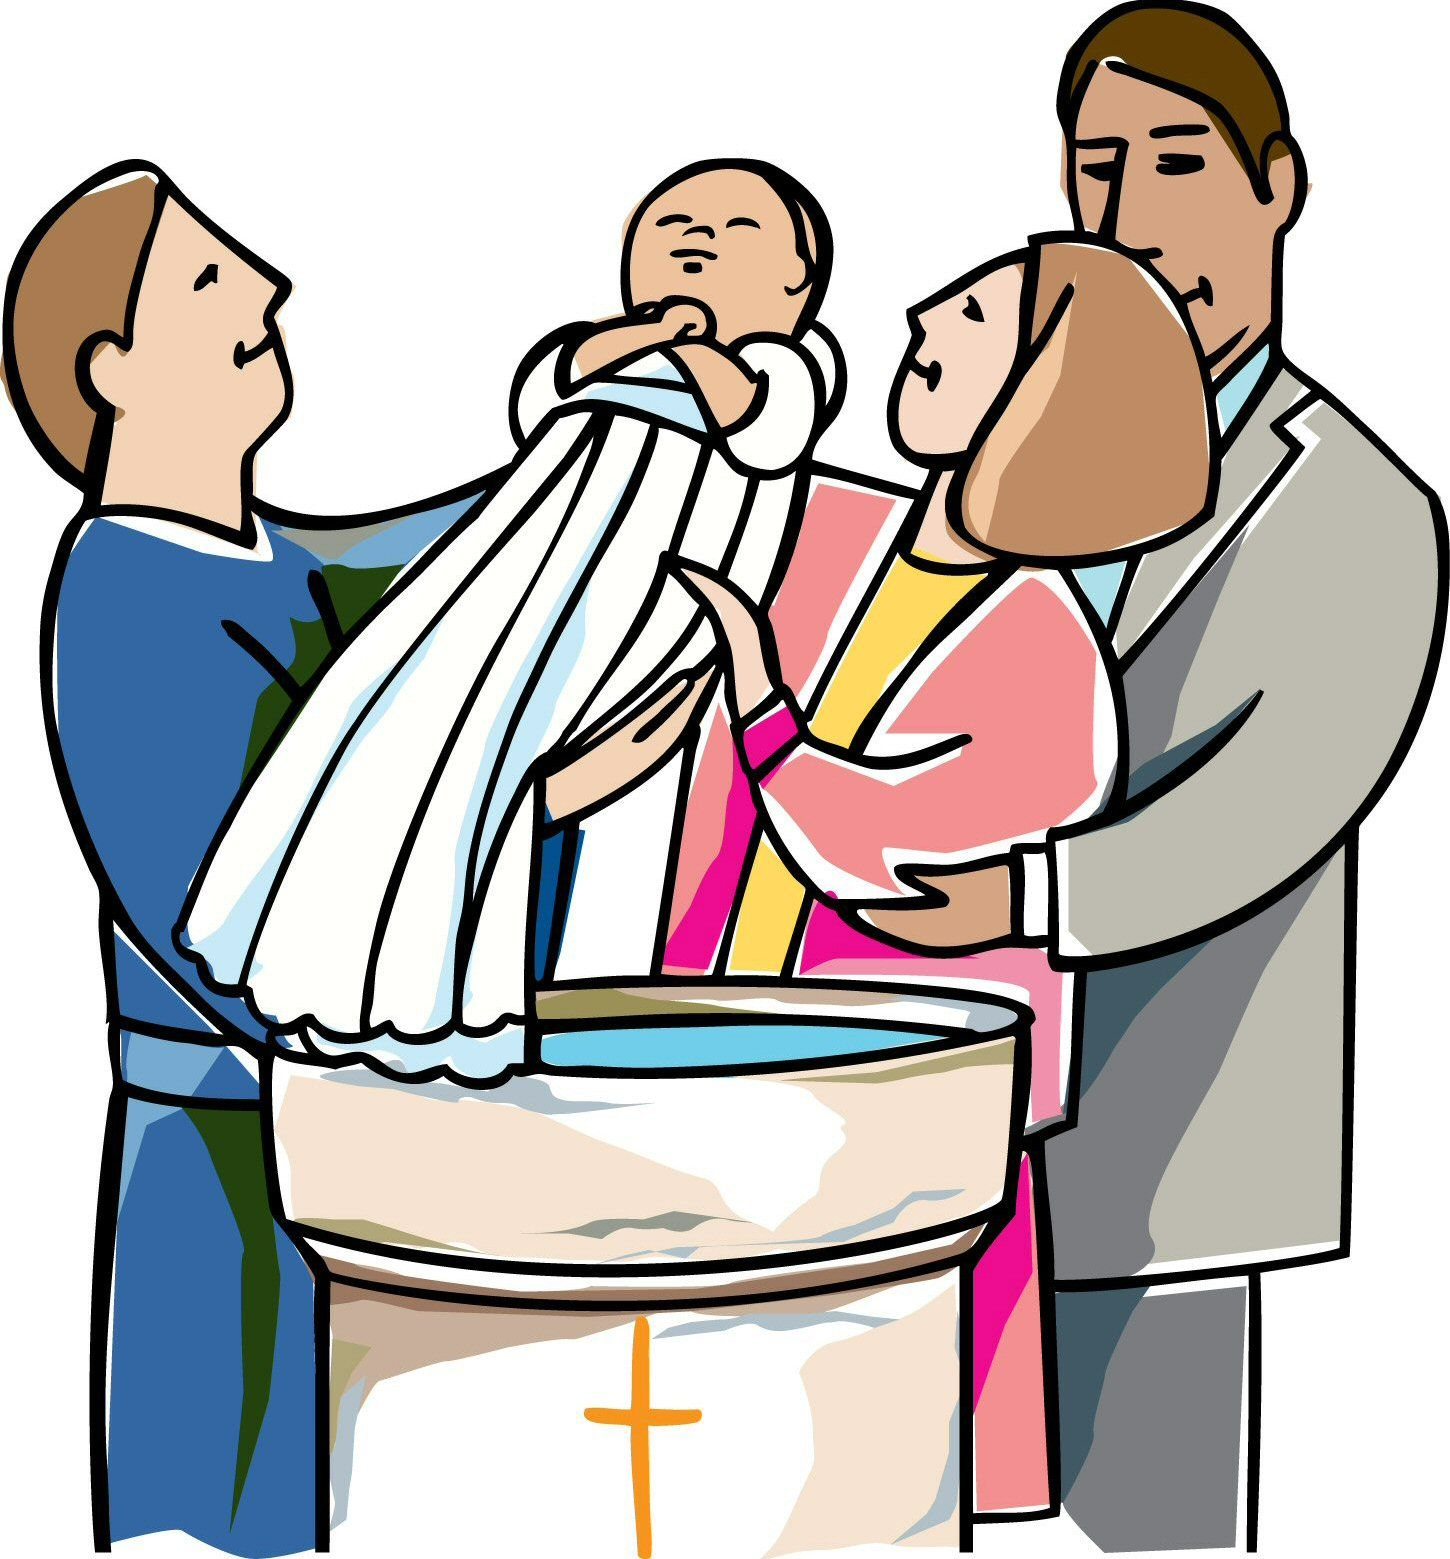 Bad clipart priest. Catholic clip art baptism